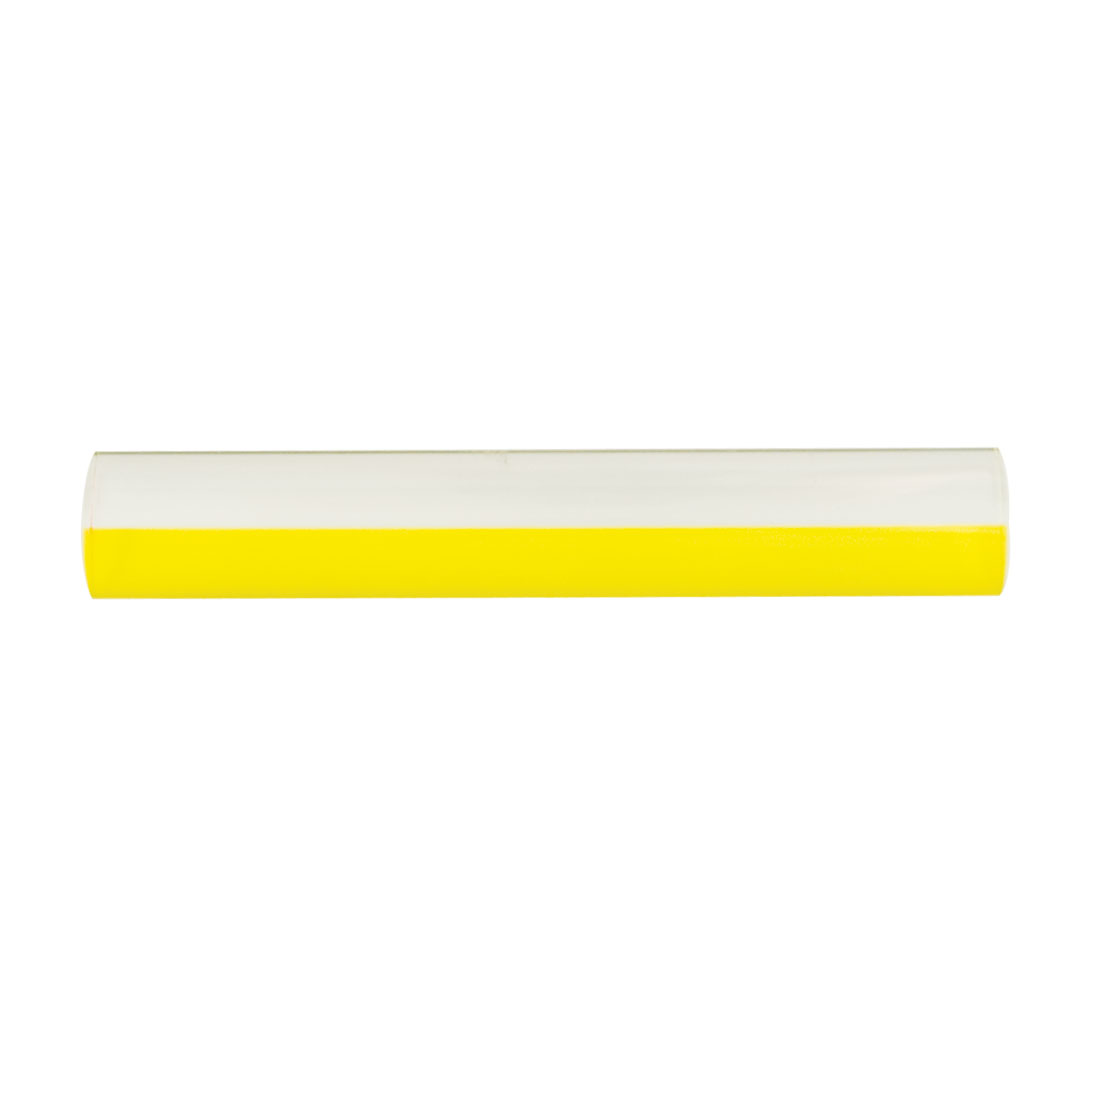 EZ Magnibar- Half-Yellow- 6 inches